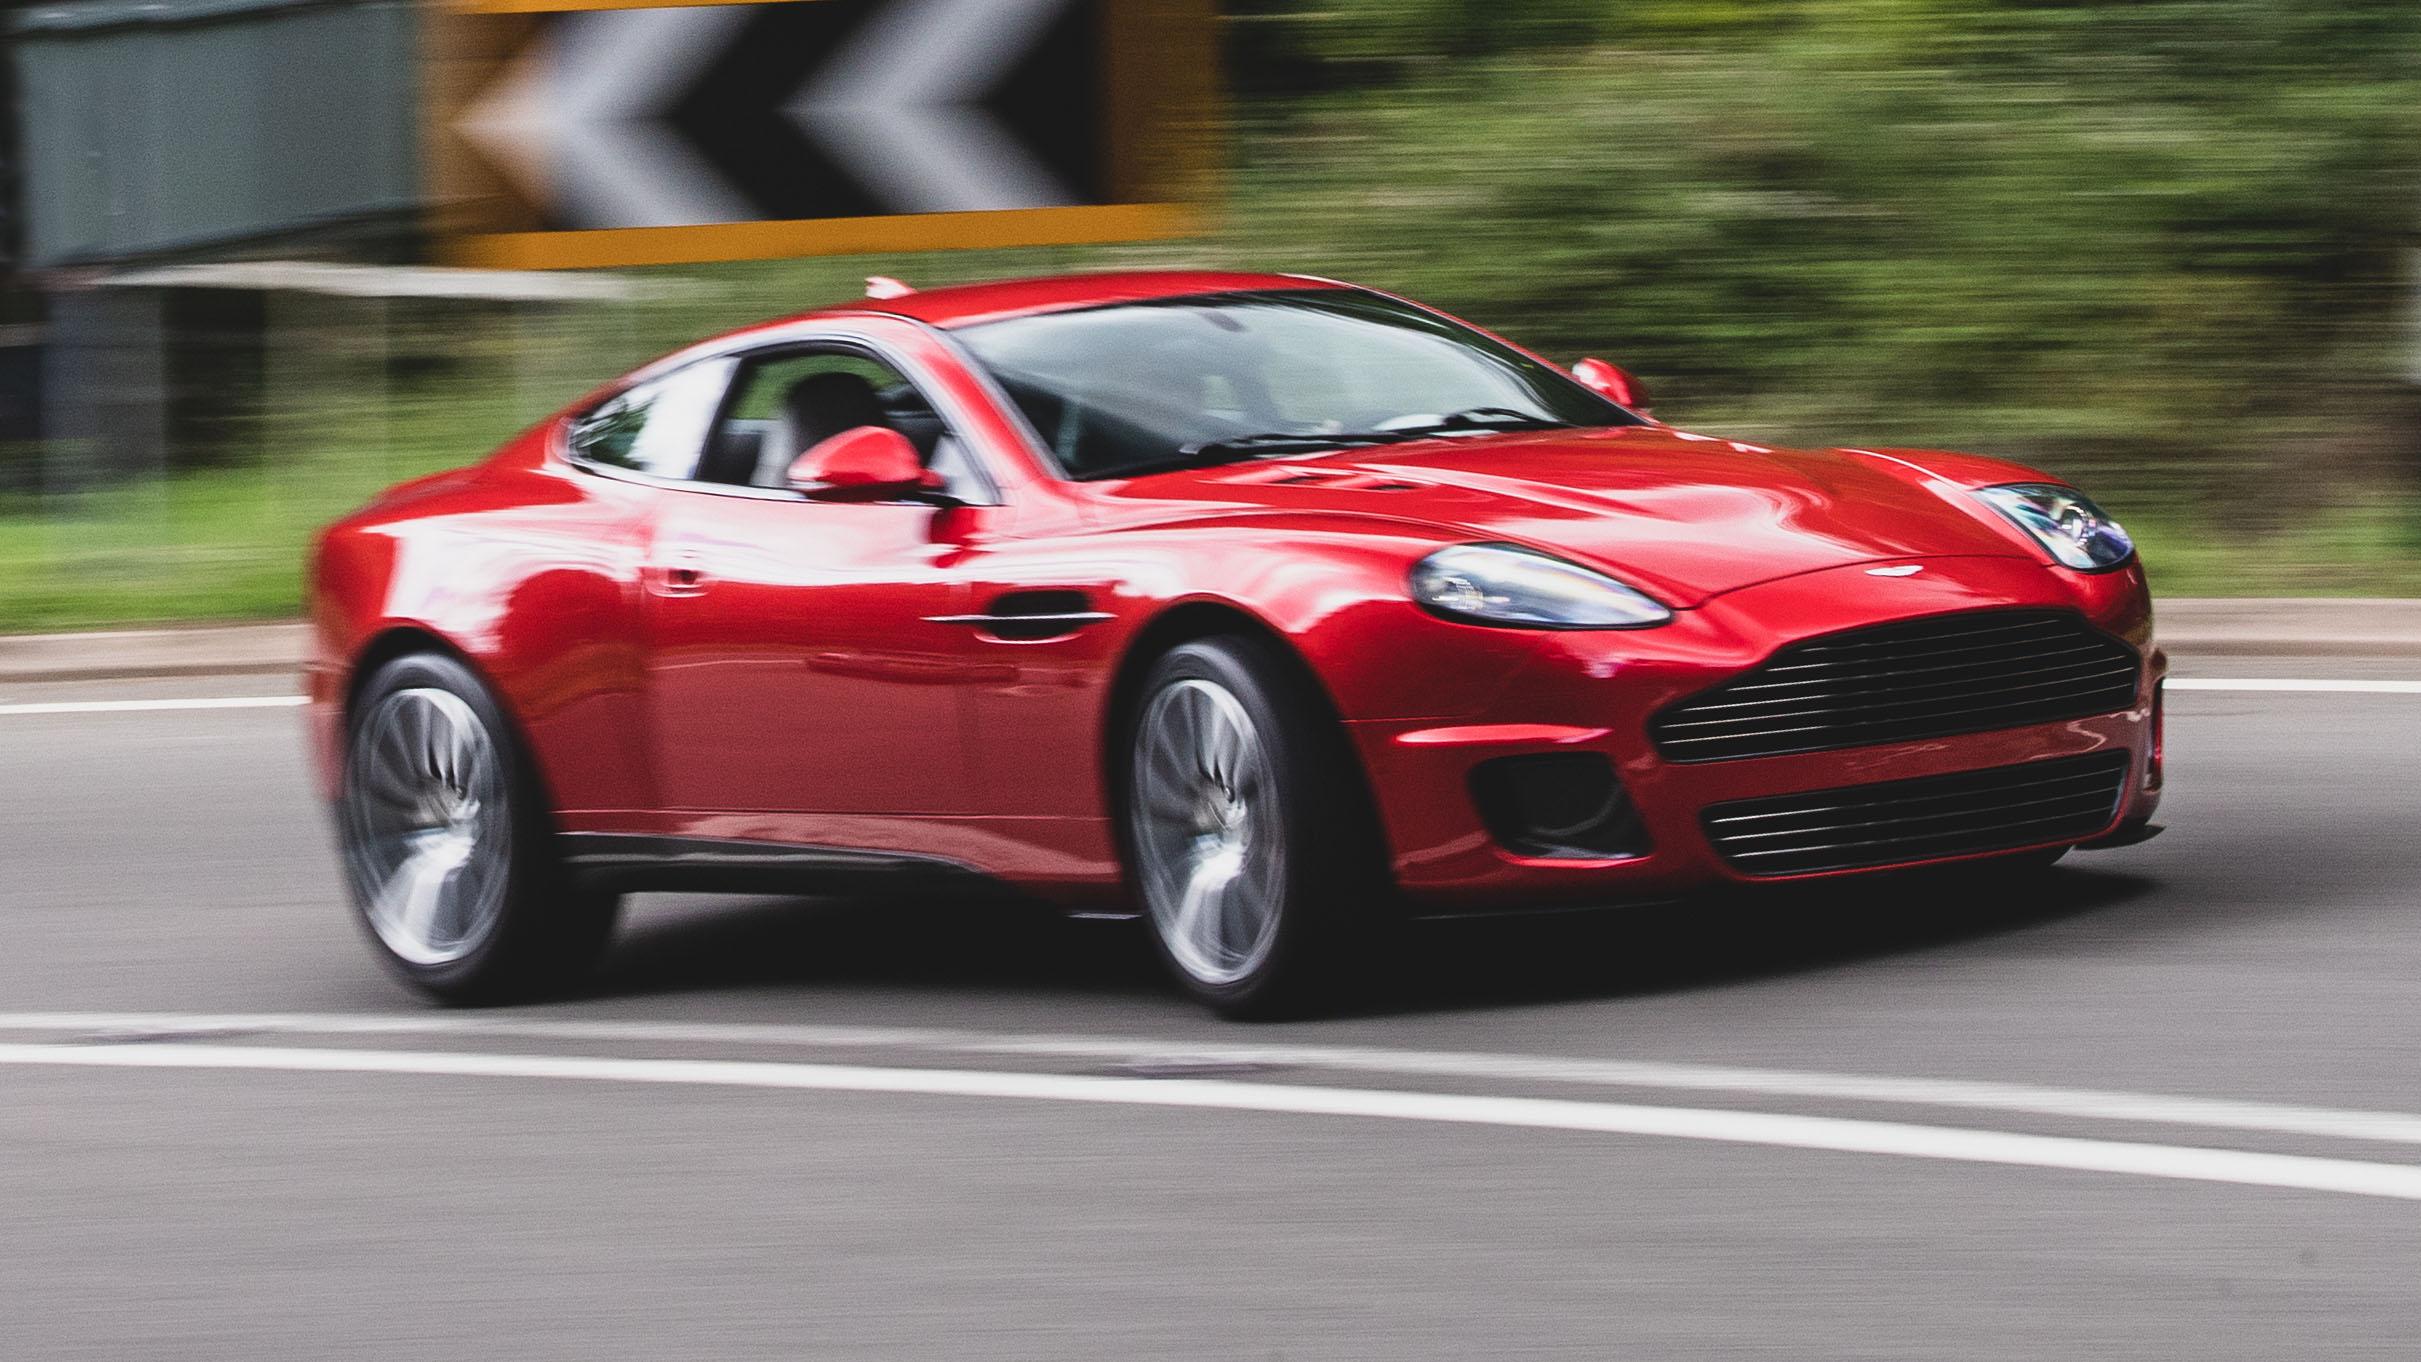 Top Gear S Aston Martin Vanquish 25 By Callum Review Top Gear